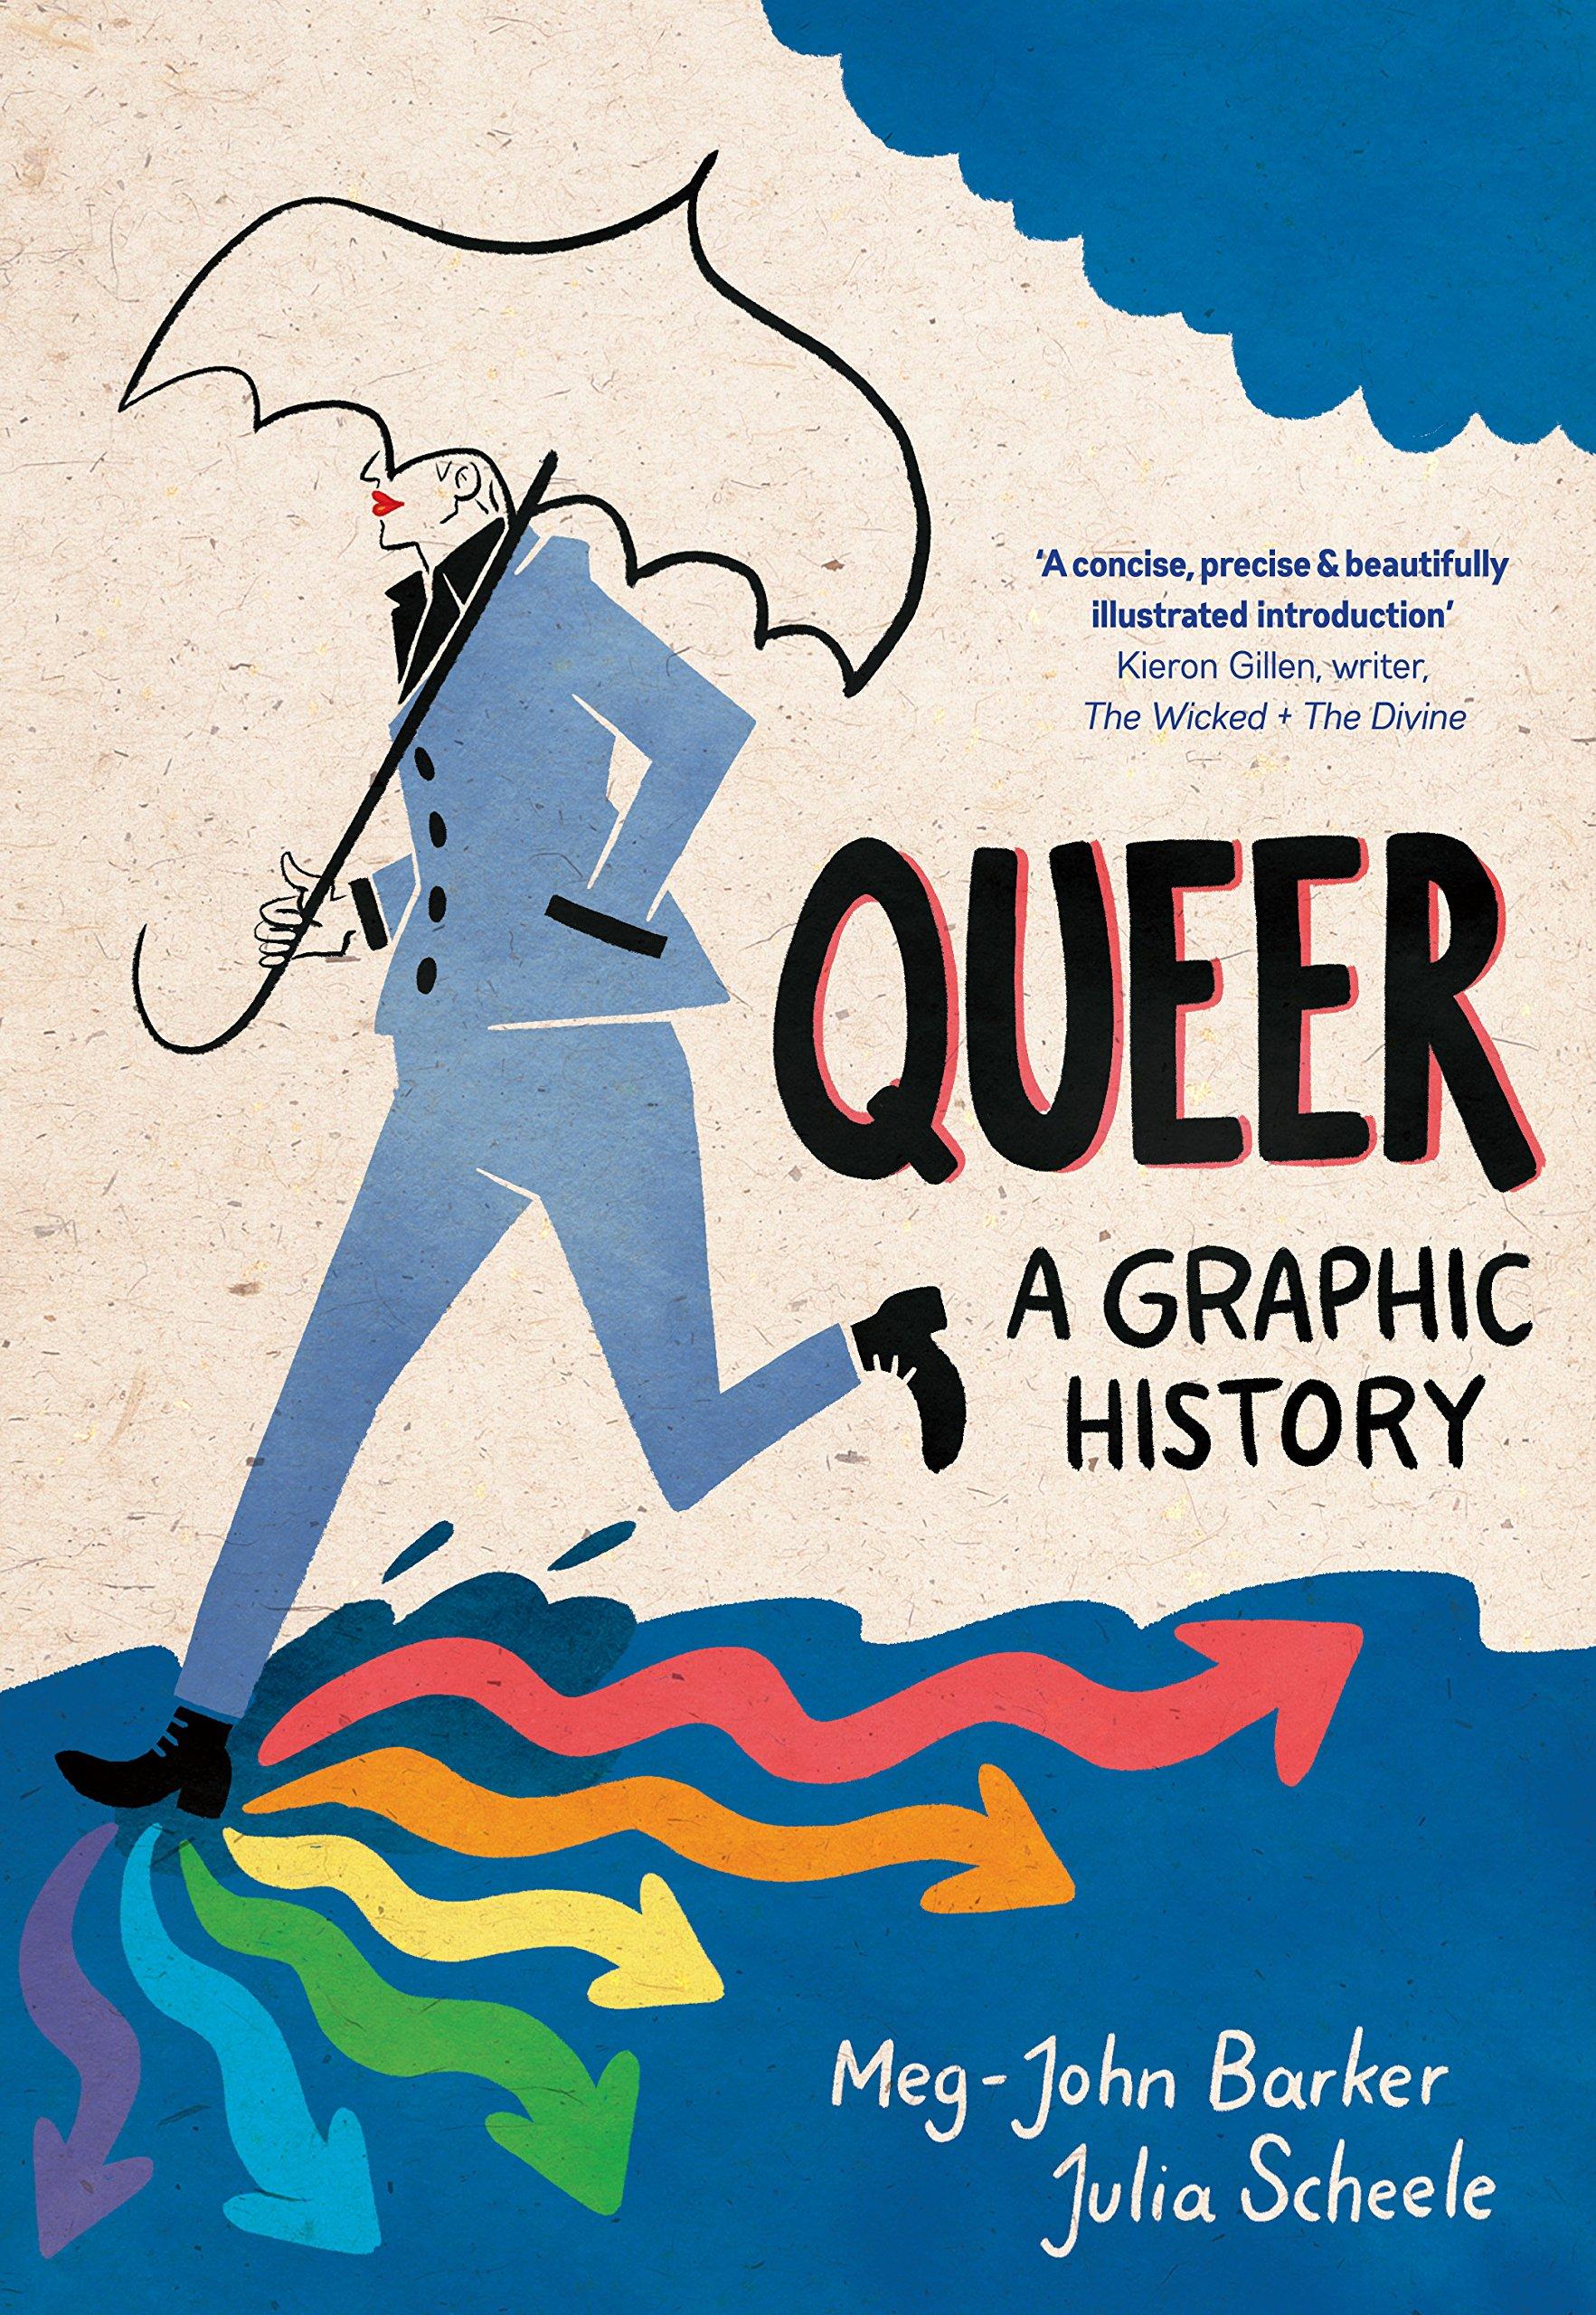 Queer: A Graphic History by Meg-John Barker, Julia Scheele